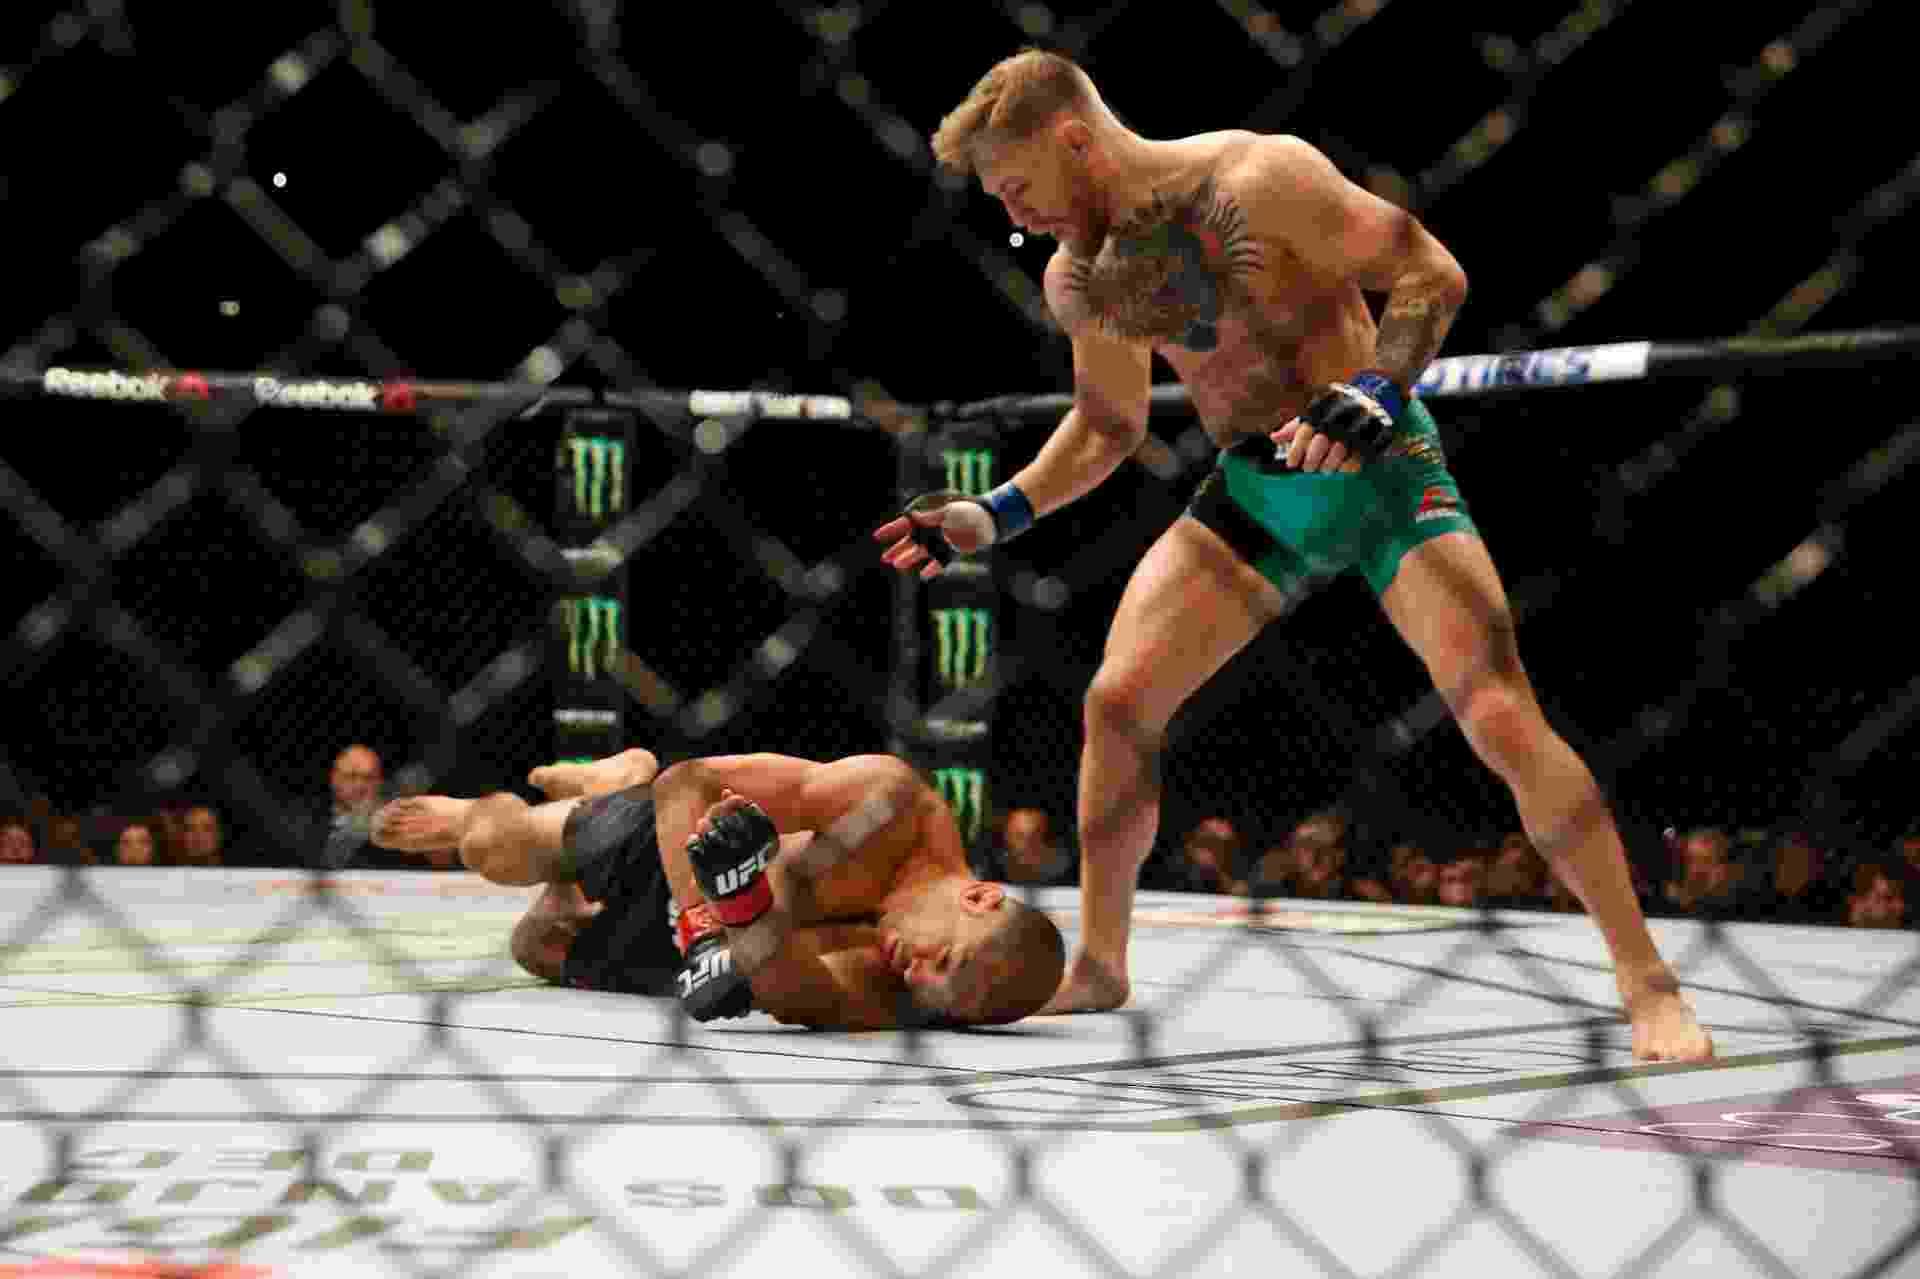 José Aldo desaba depois de soco de Conor McGregor, no UFC 194 - Christian Petersen/Zuffa LLC/Getty Images